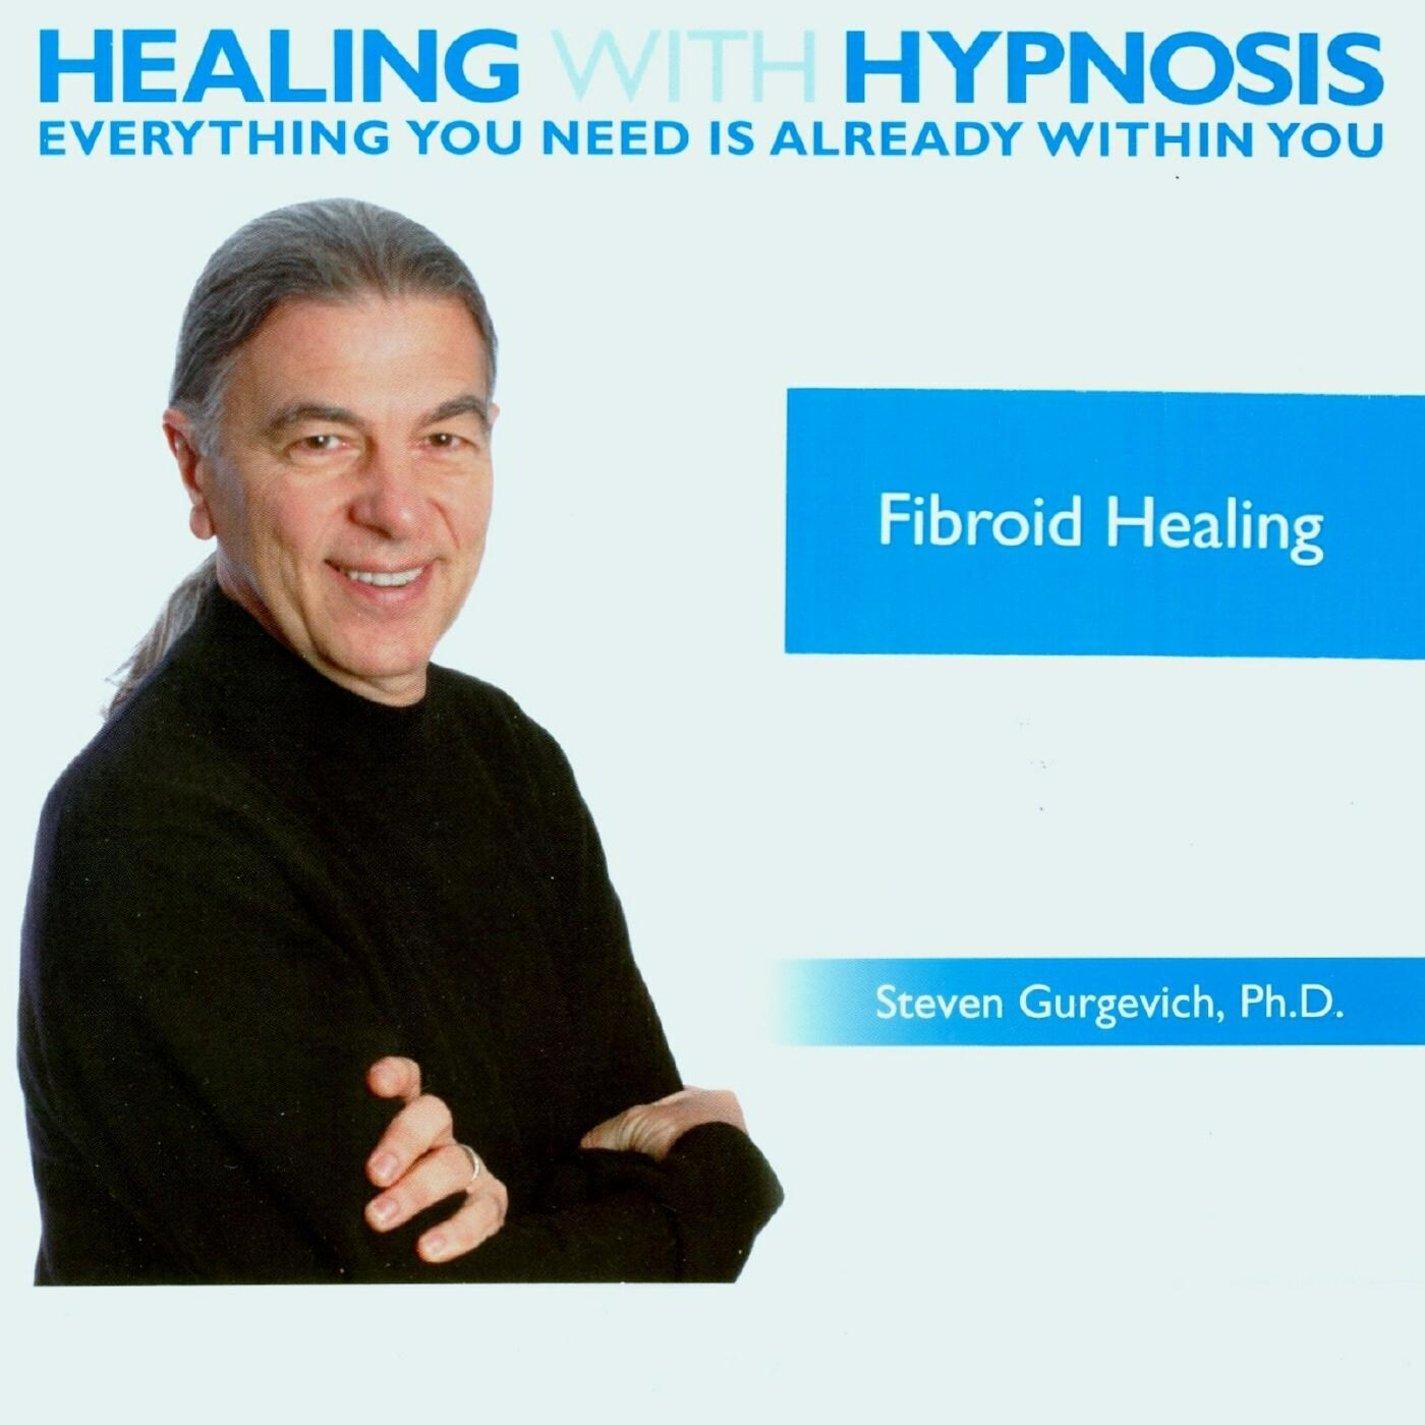 Fibroid Healing                                                                                                                                                                                                                                                    <span class=